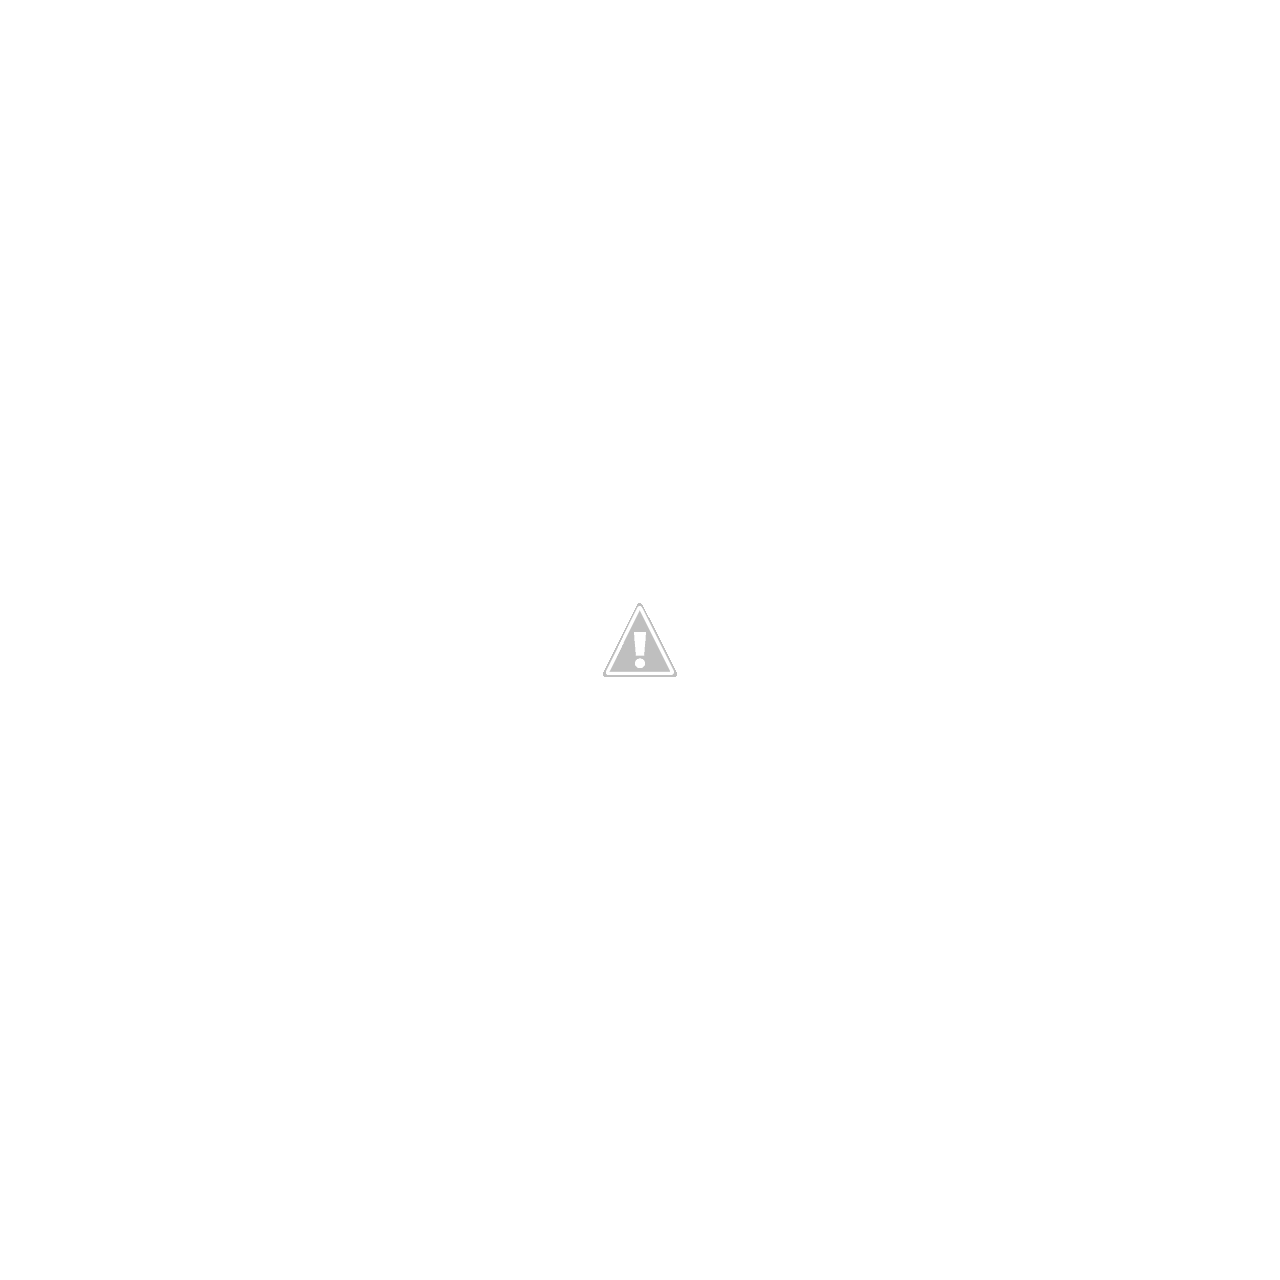 Saulat Magic Spells - Love Spells in USA, Money, Magic, Love